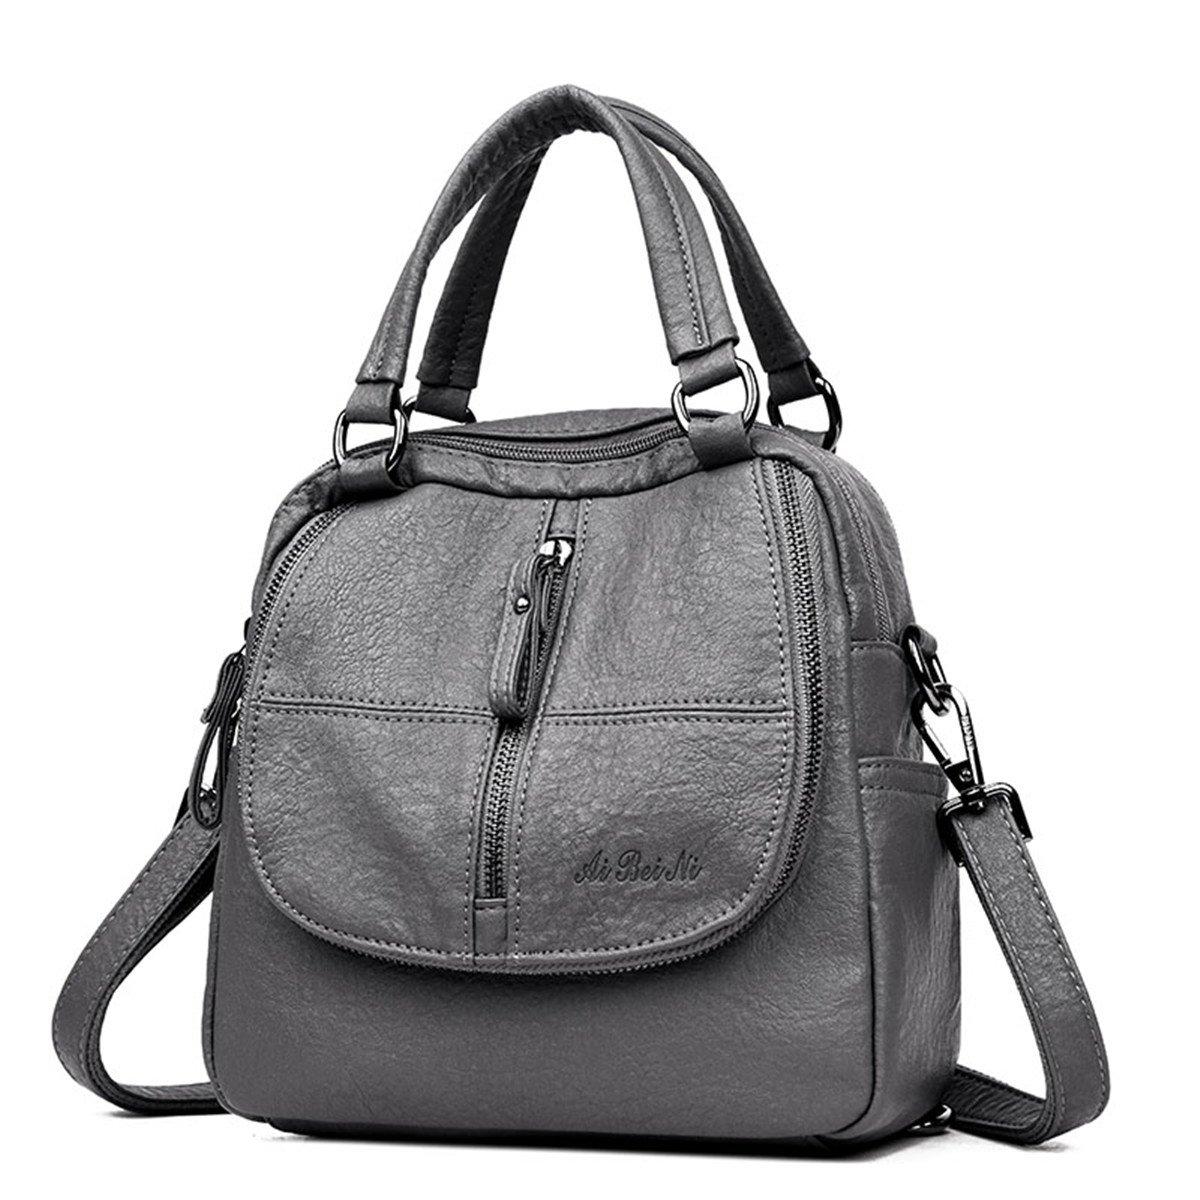 JOSEKO Women Backpack Purse, PU Washed Leather Shoulder Bag Ladies Travel Backpack Multifunction Handbag Grey by JOSEKO